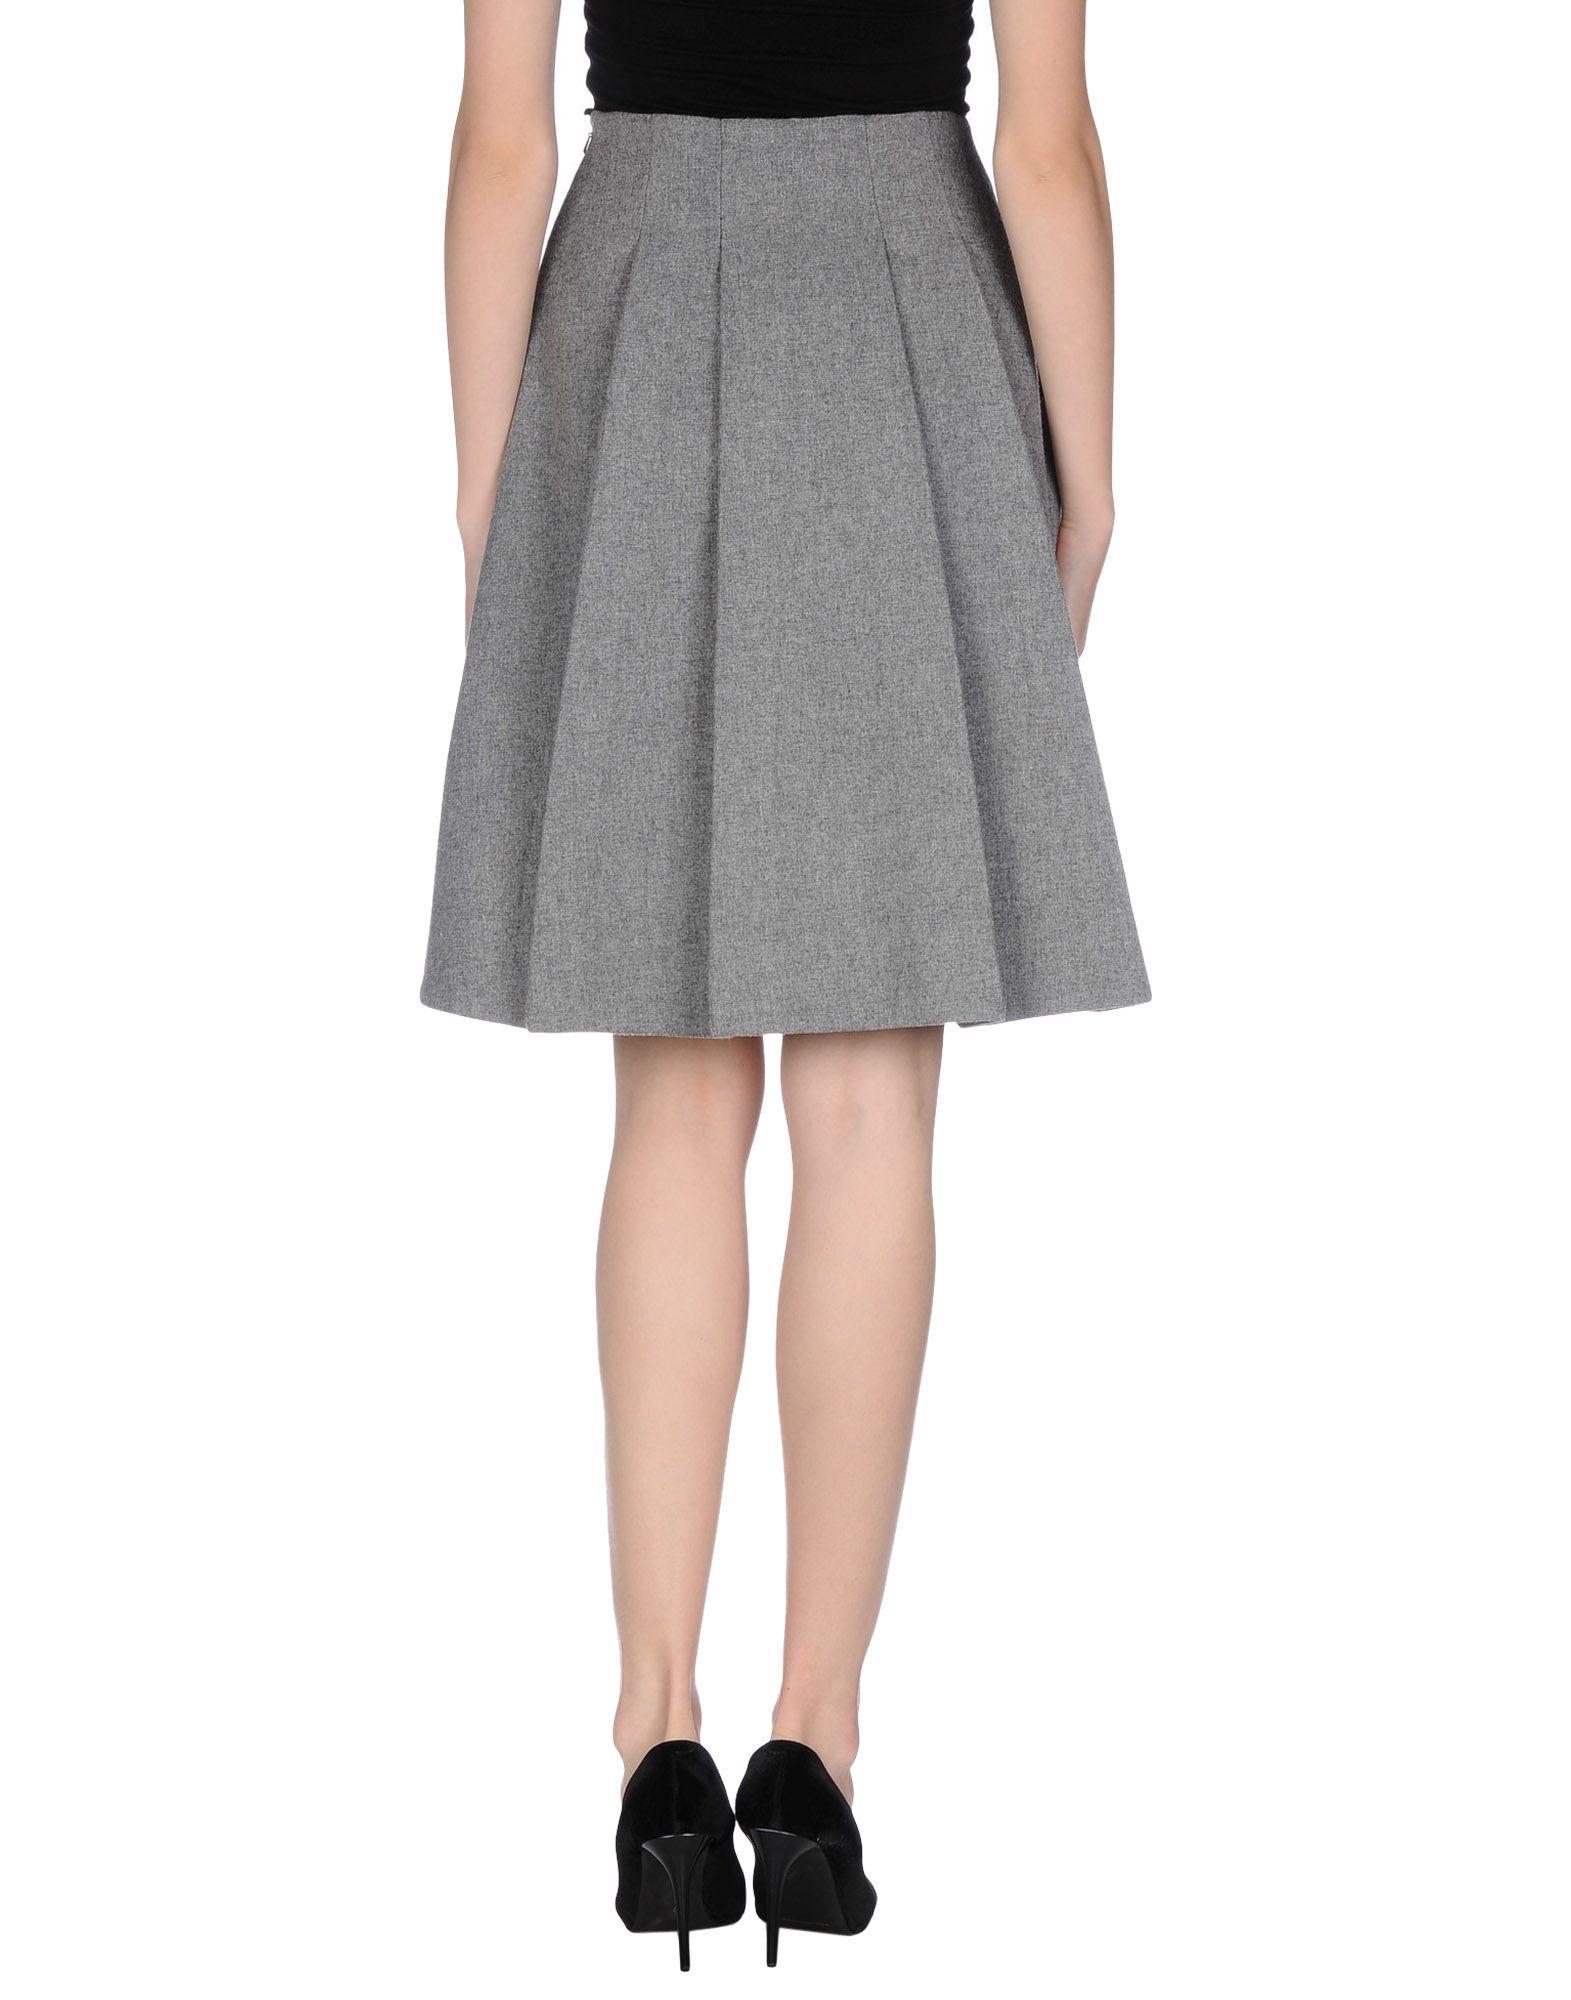 fwss knee length skirt in gray light grey save 61 lyst